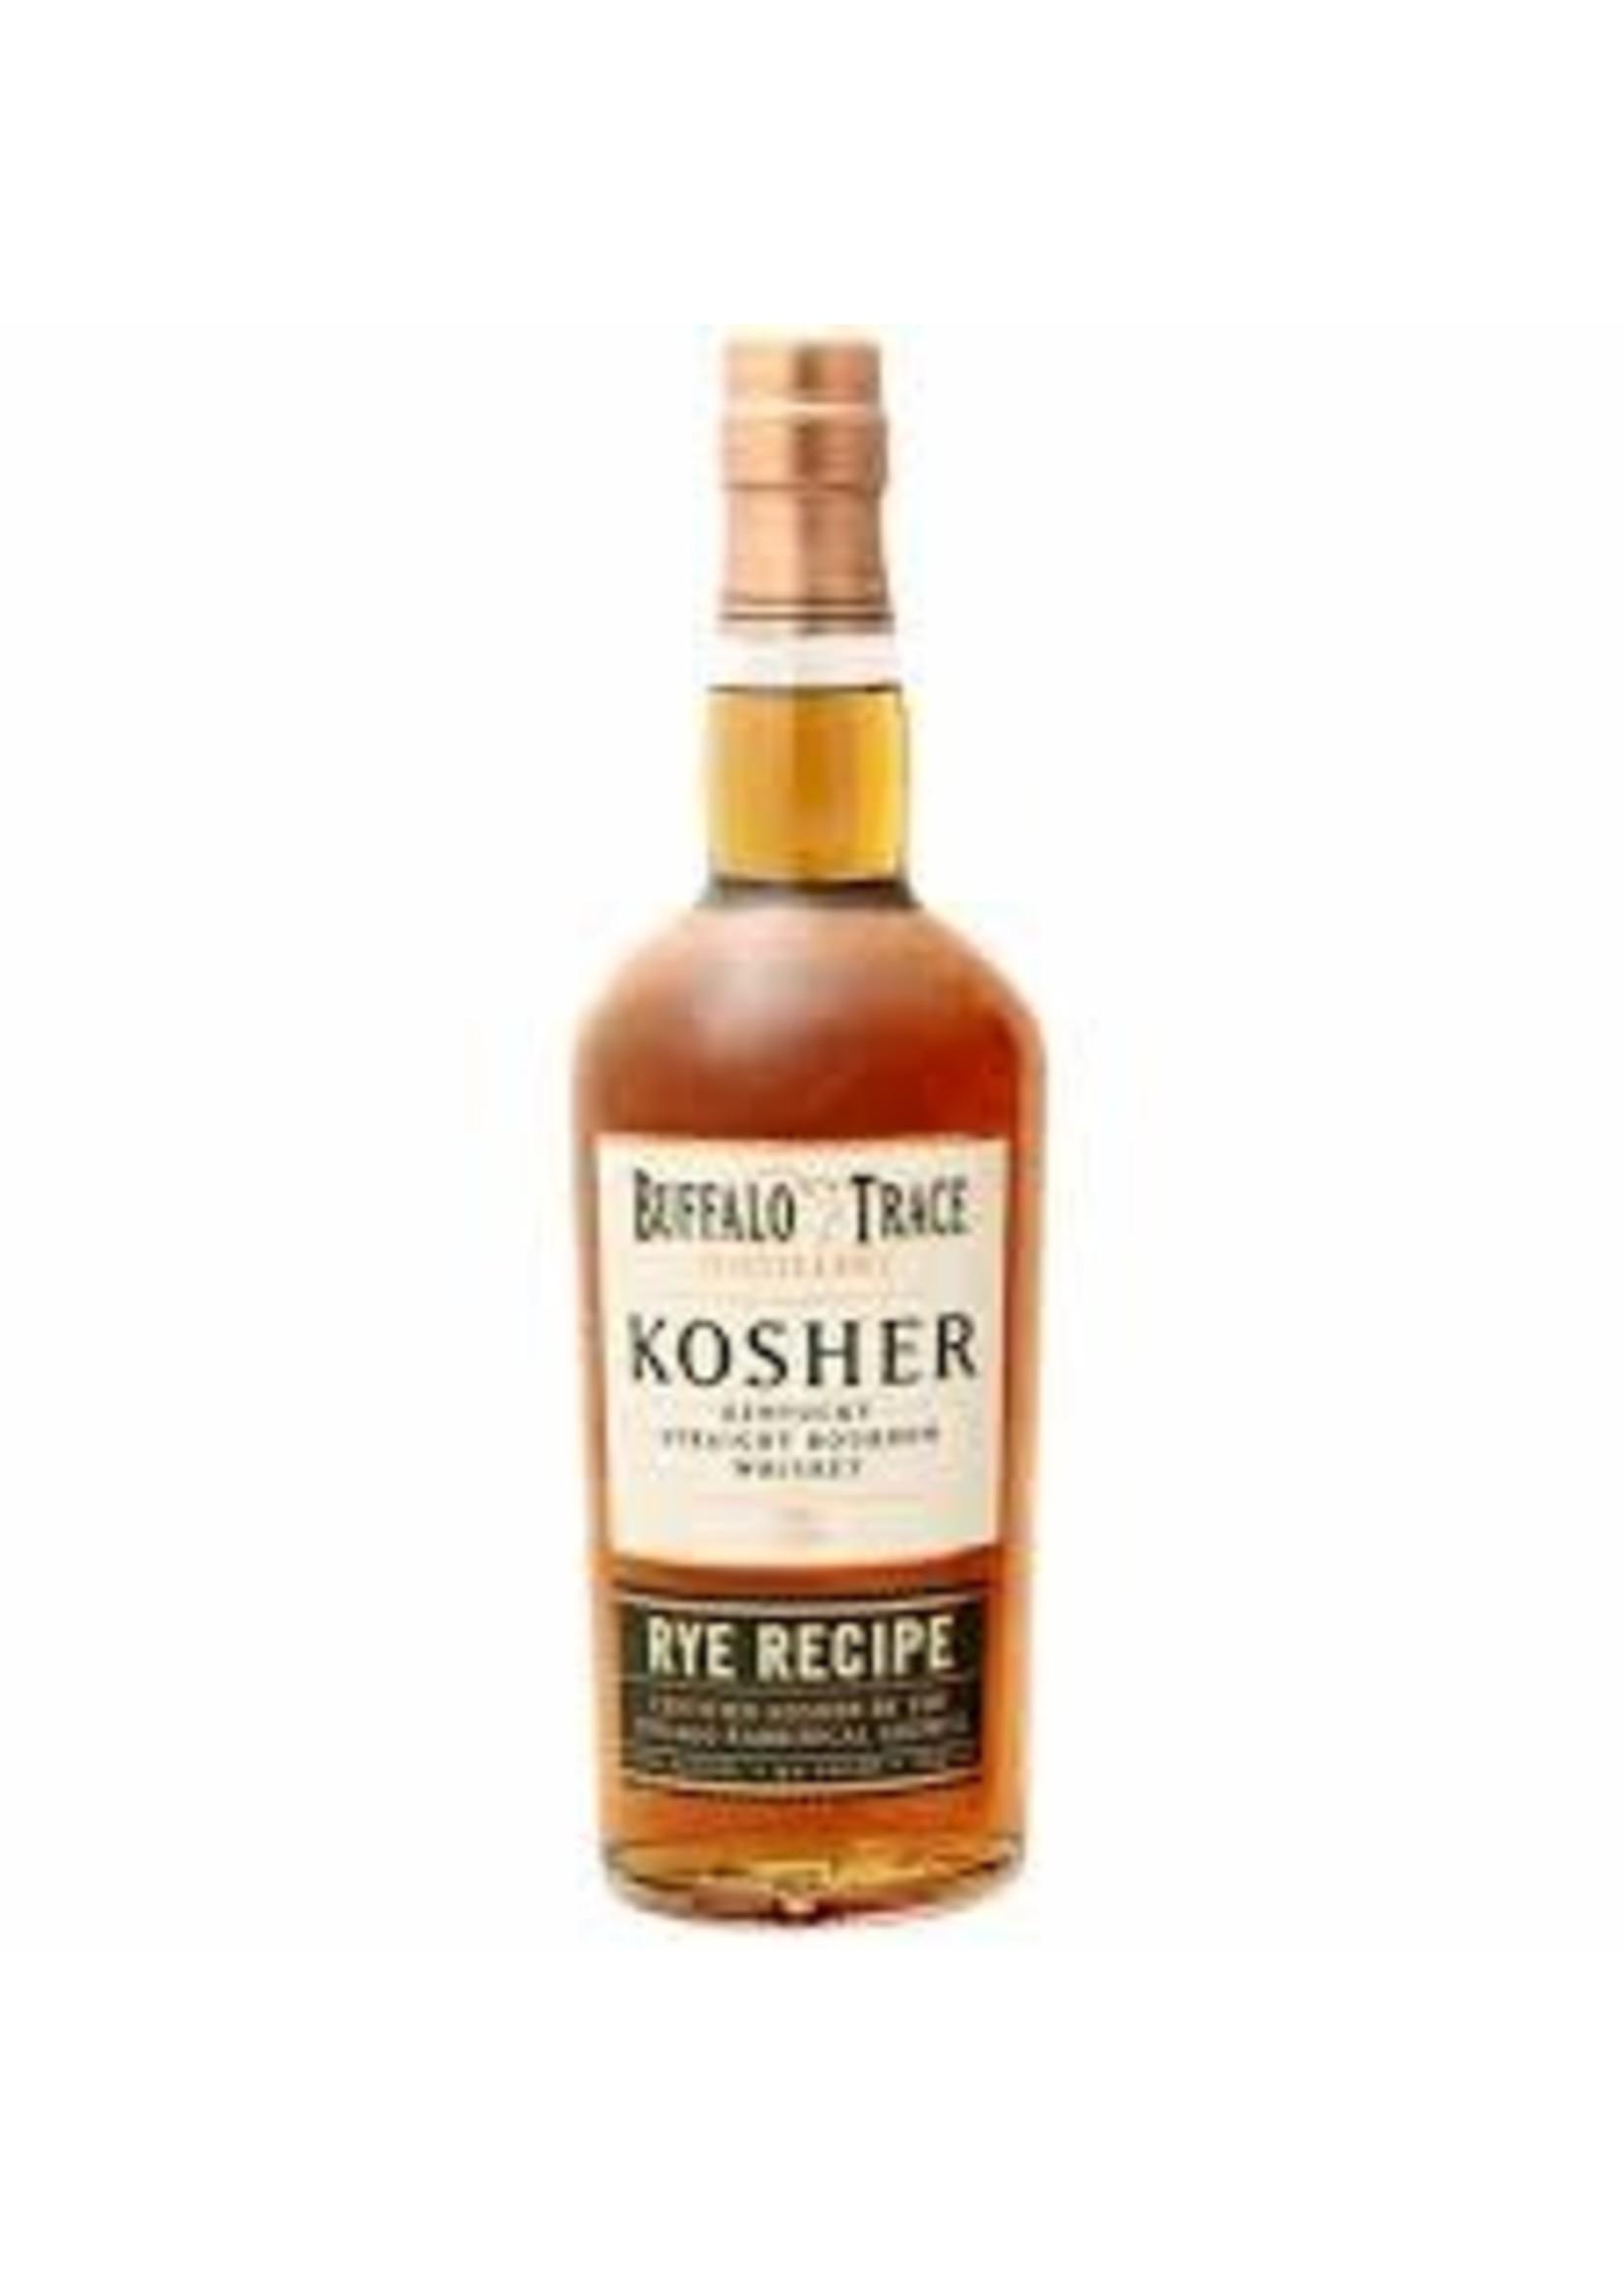 Buffalo Trace Bourbon Kosher Rye Recipe 750ml